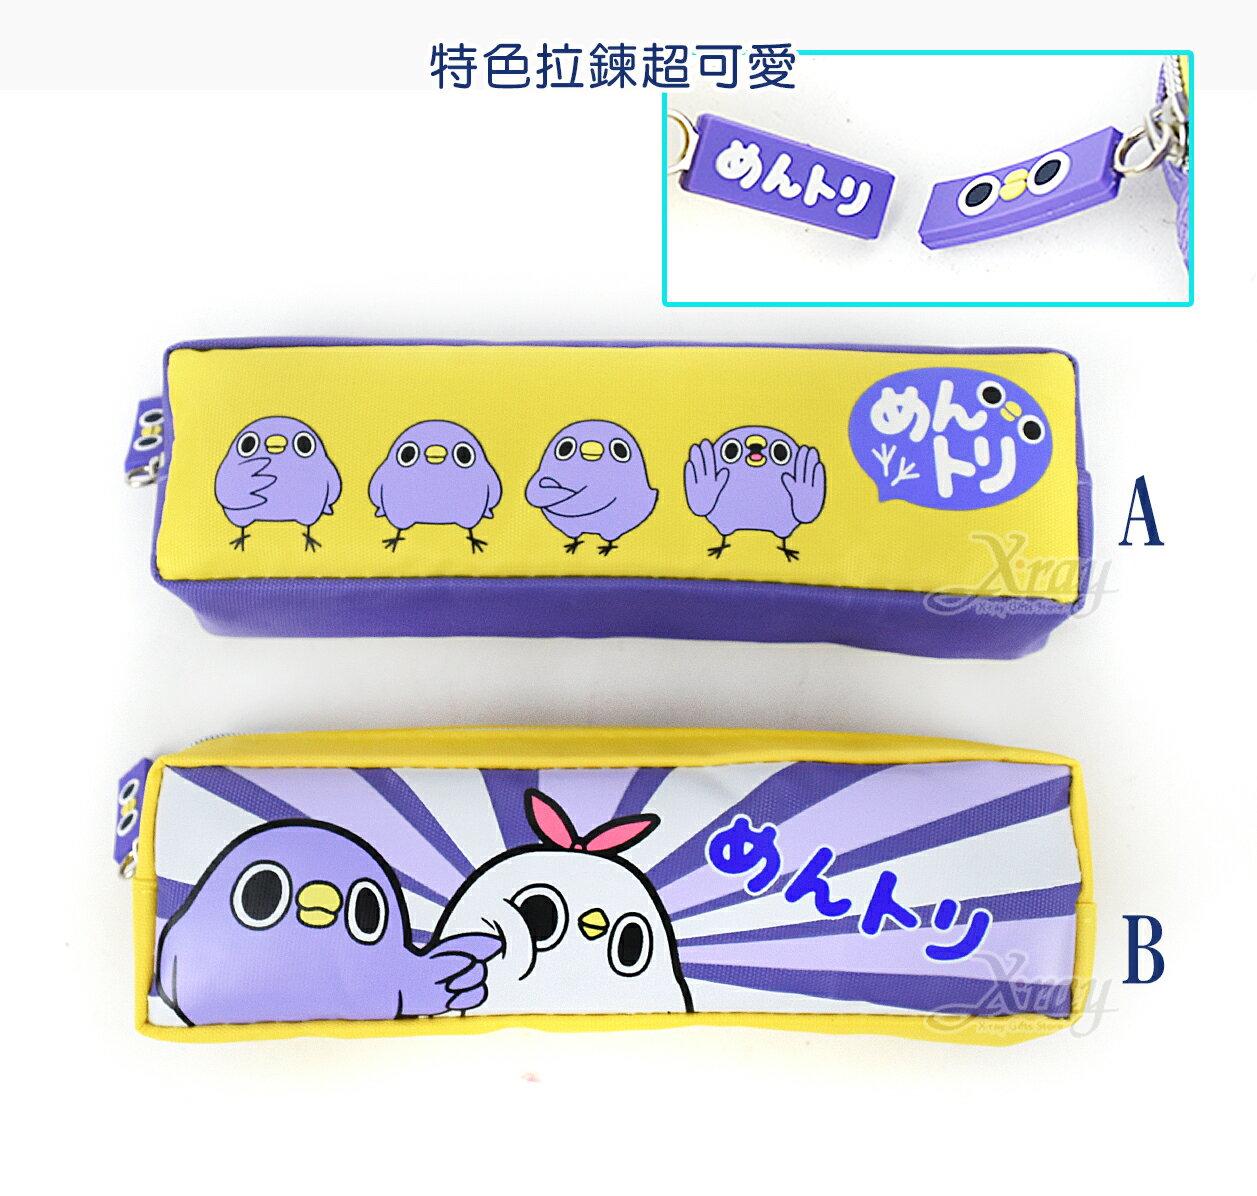 X射線【C533655】懶得鳥你-中方型筆袋,美妝小物包/筆袋/面紙包/化妝包/零錢包/收納包/皮夾/手機袋/鑰匙包